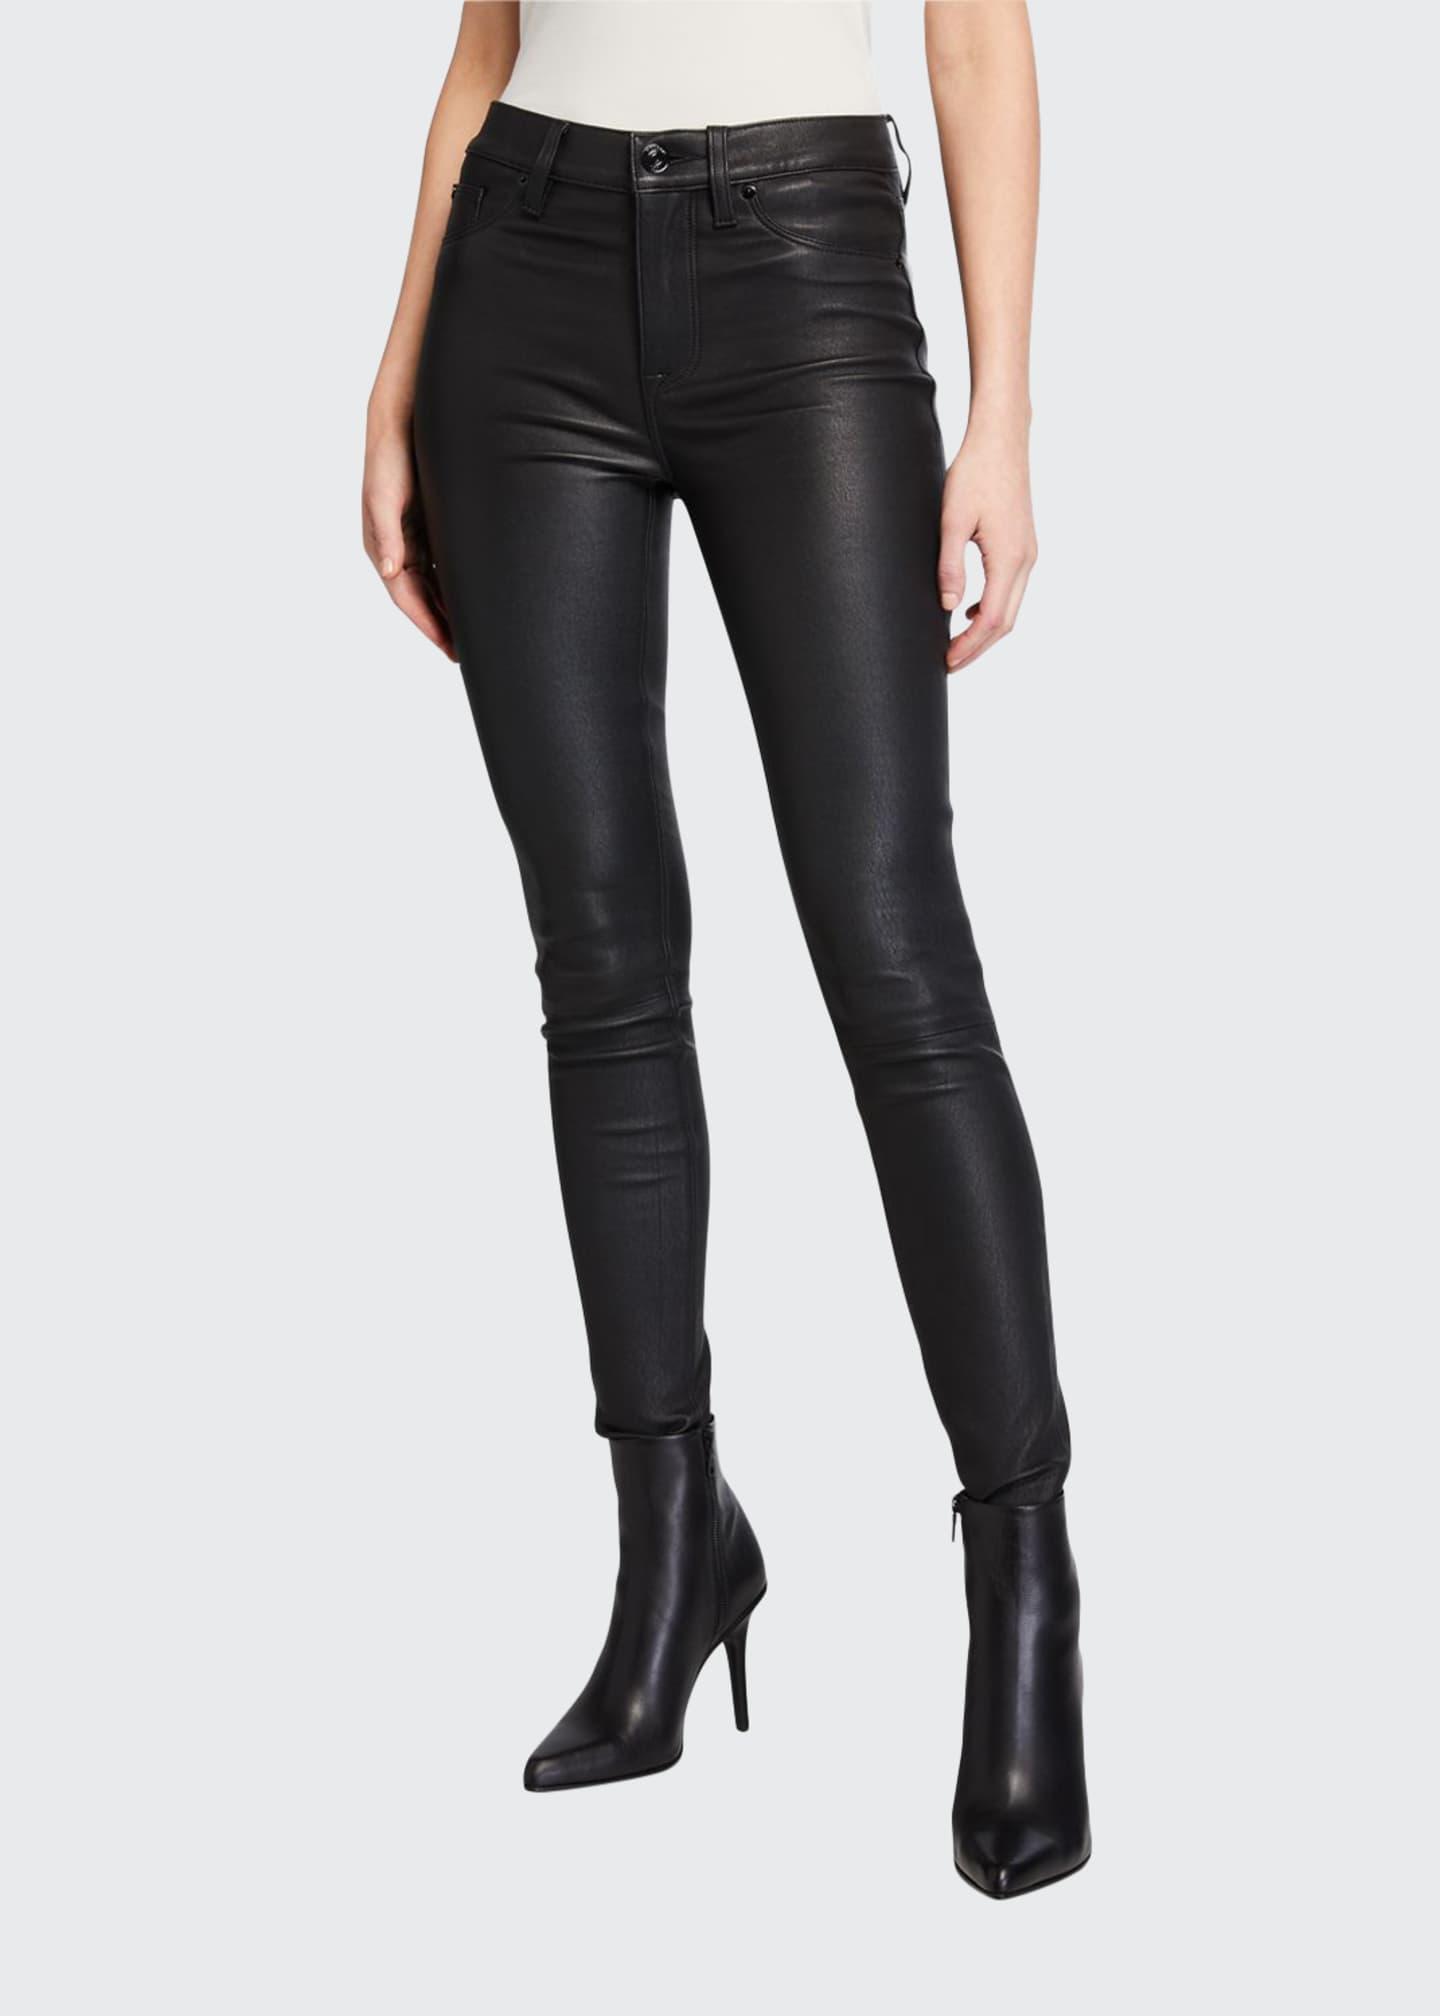 Hudson Barbara High-Rise Super Skinny Leather Pants